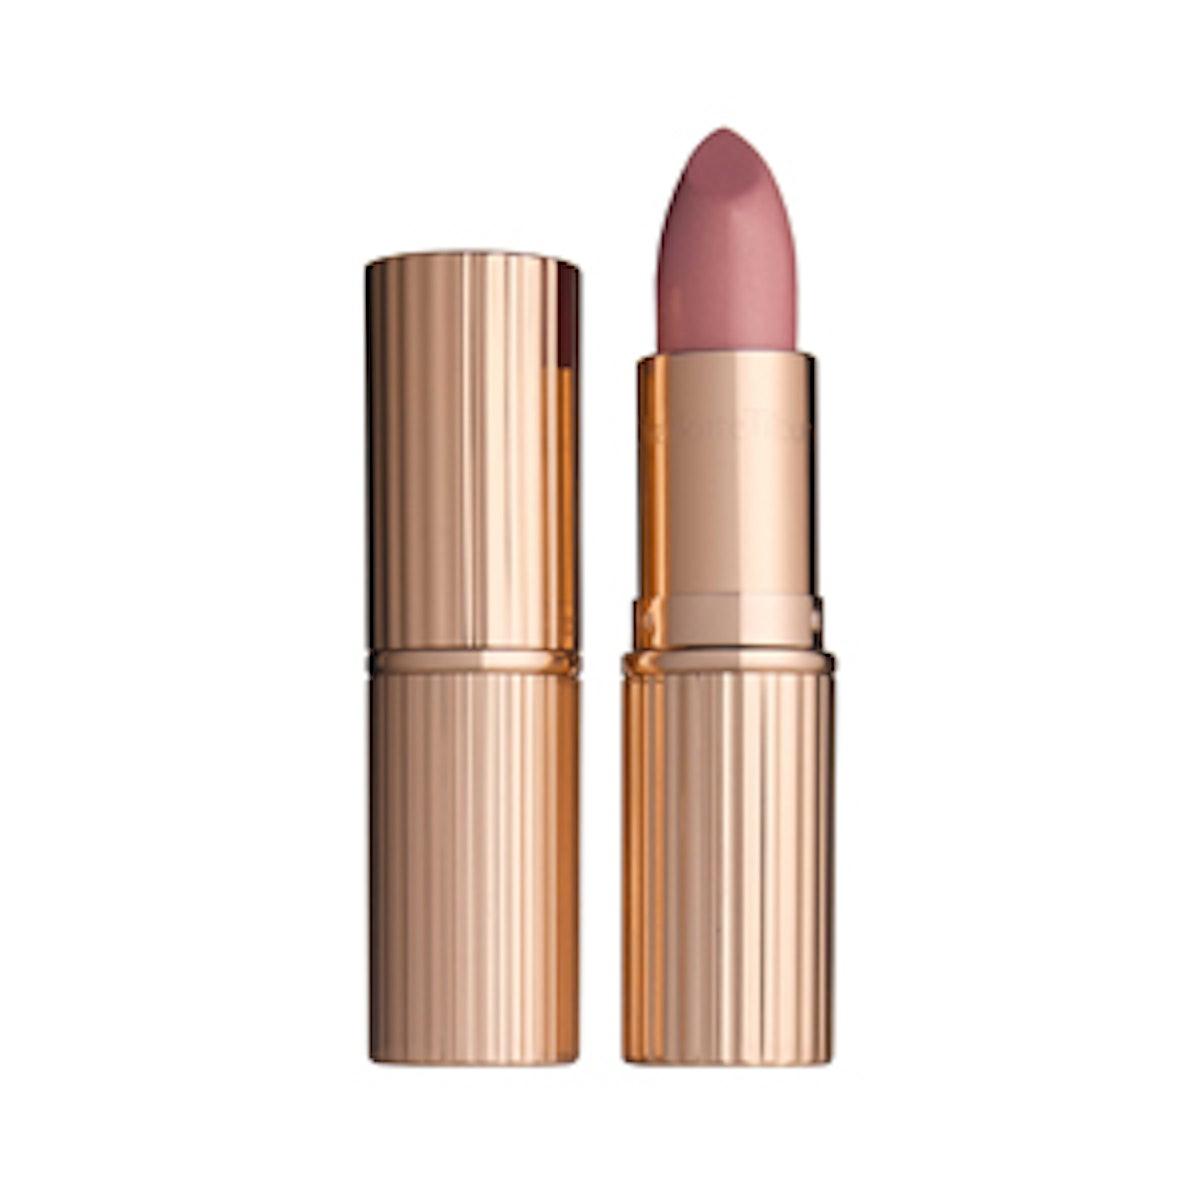 Lipstick in Bitch Perfect